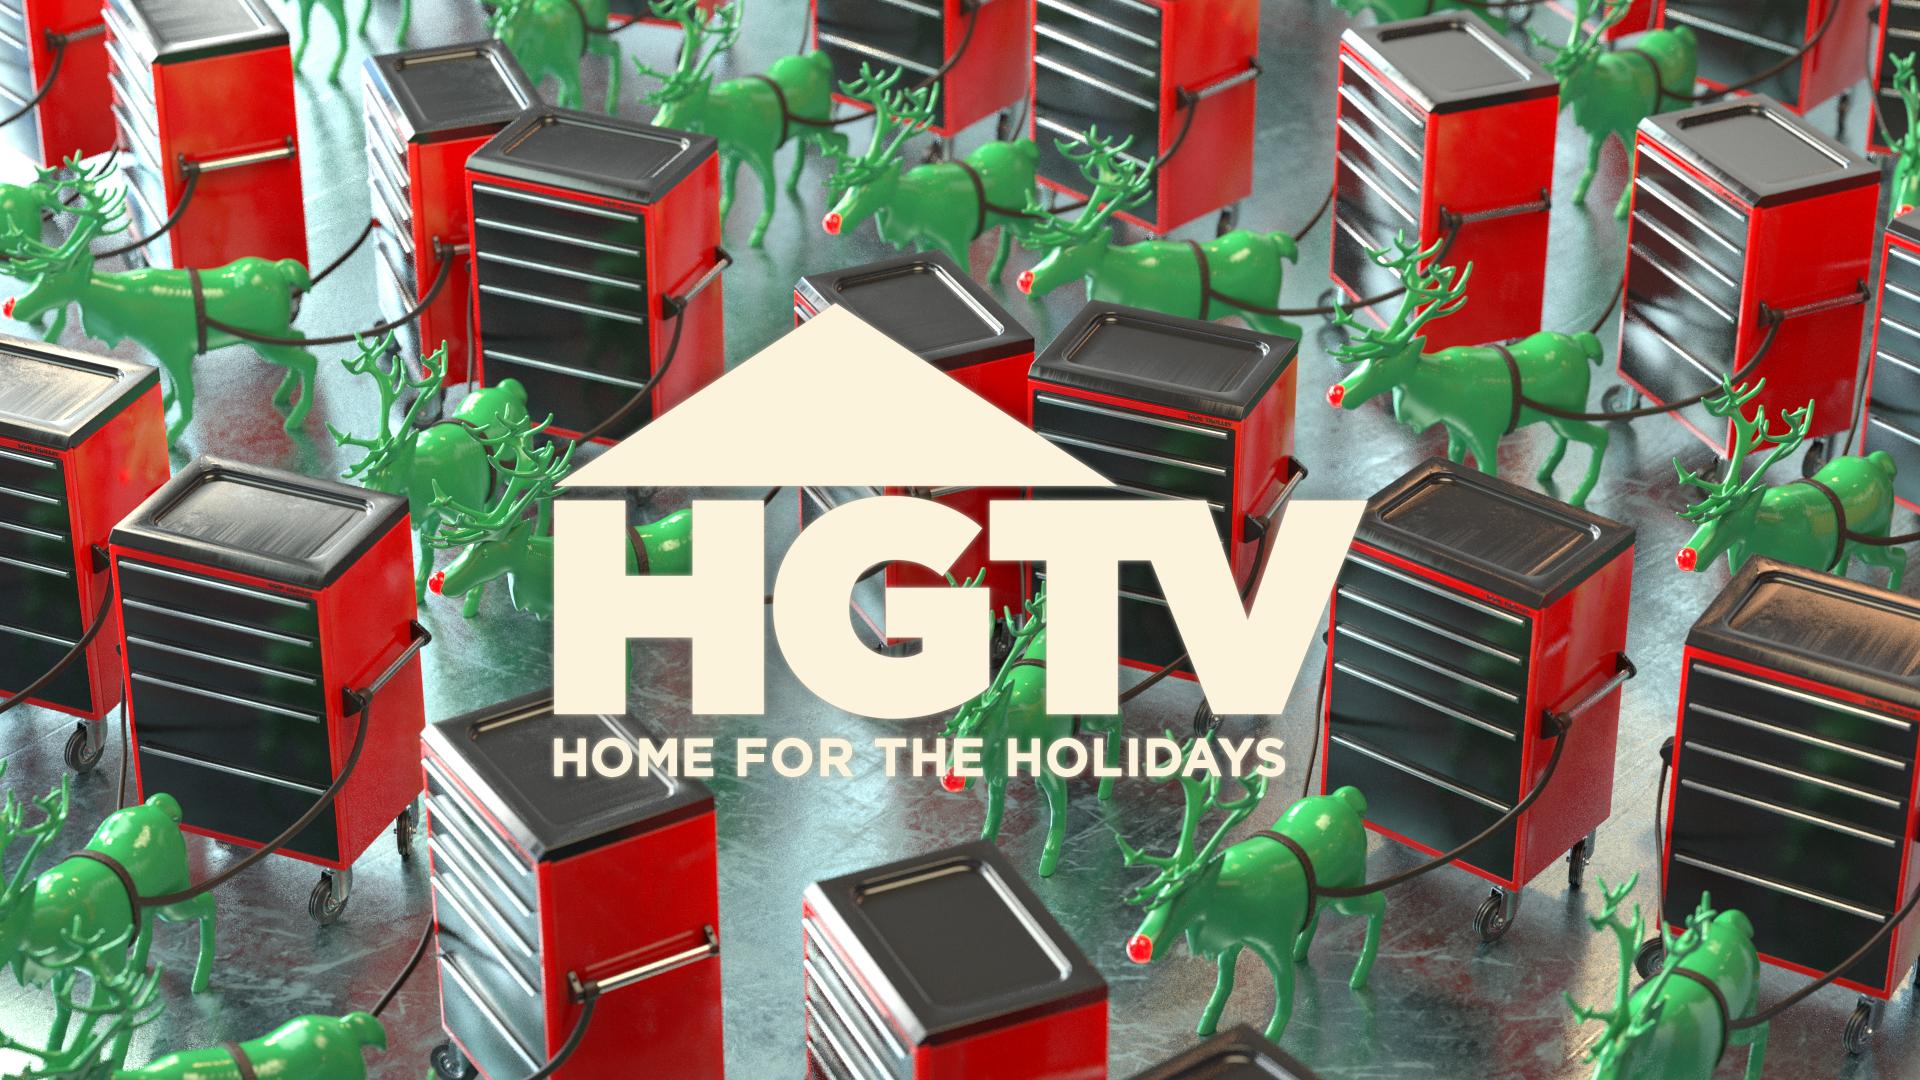 HGTV_L2_04__HGTVLogo_A_Reindeer